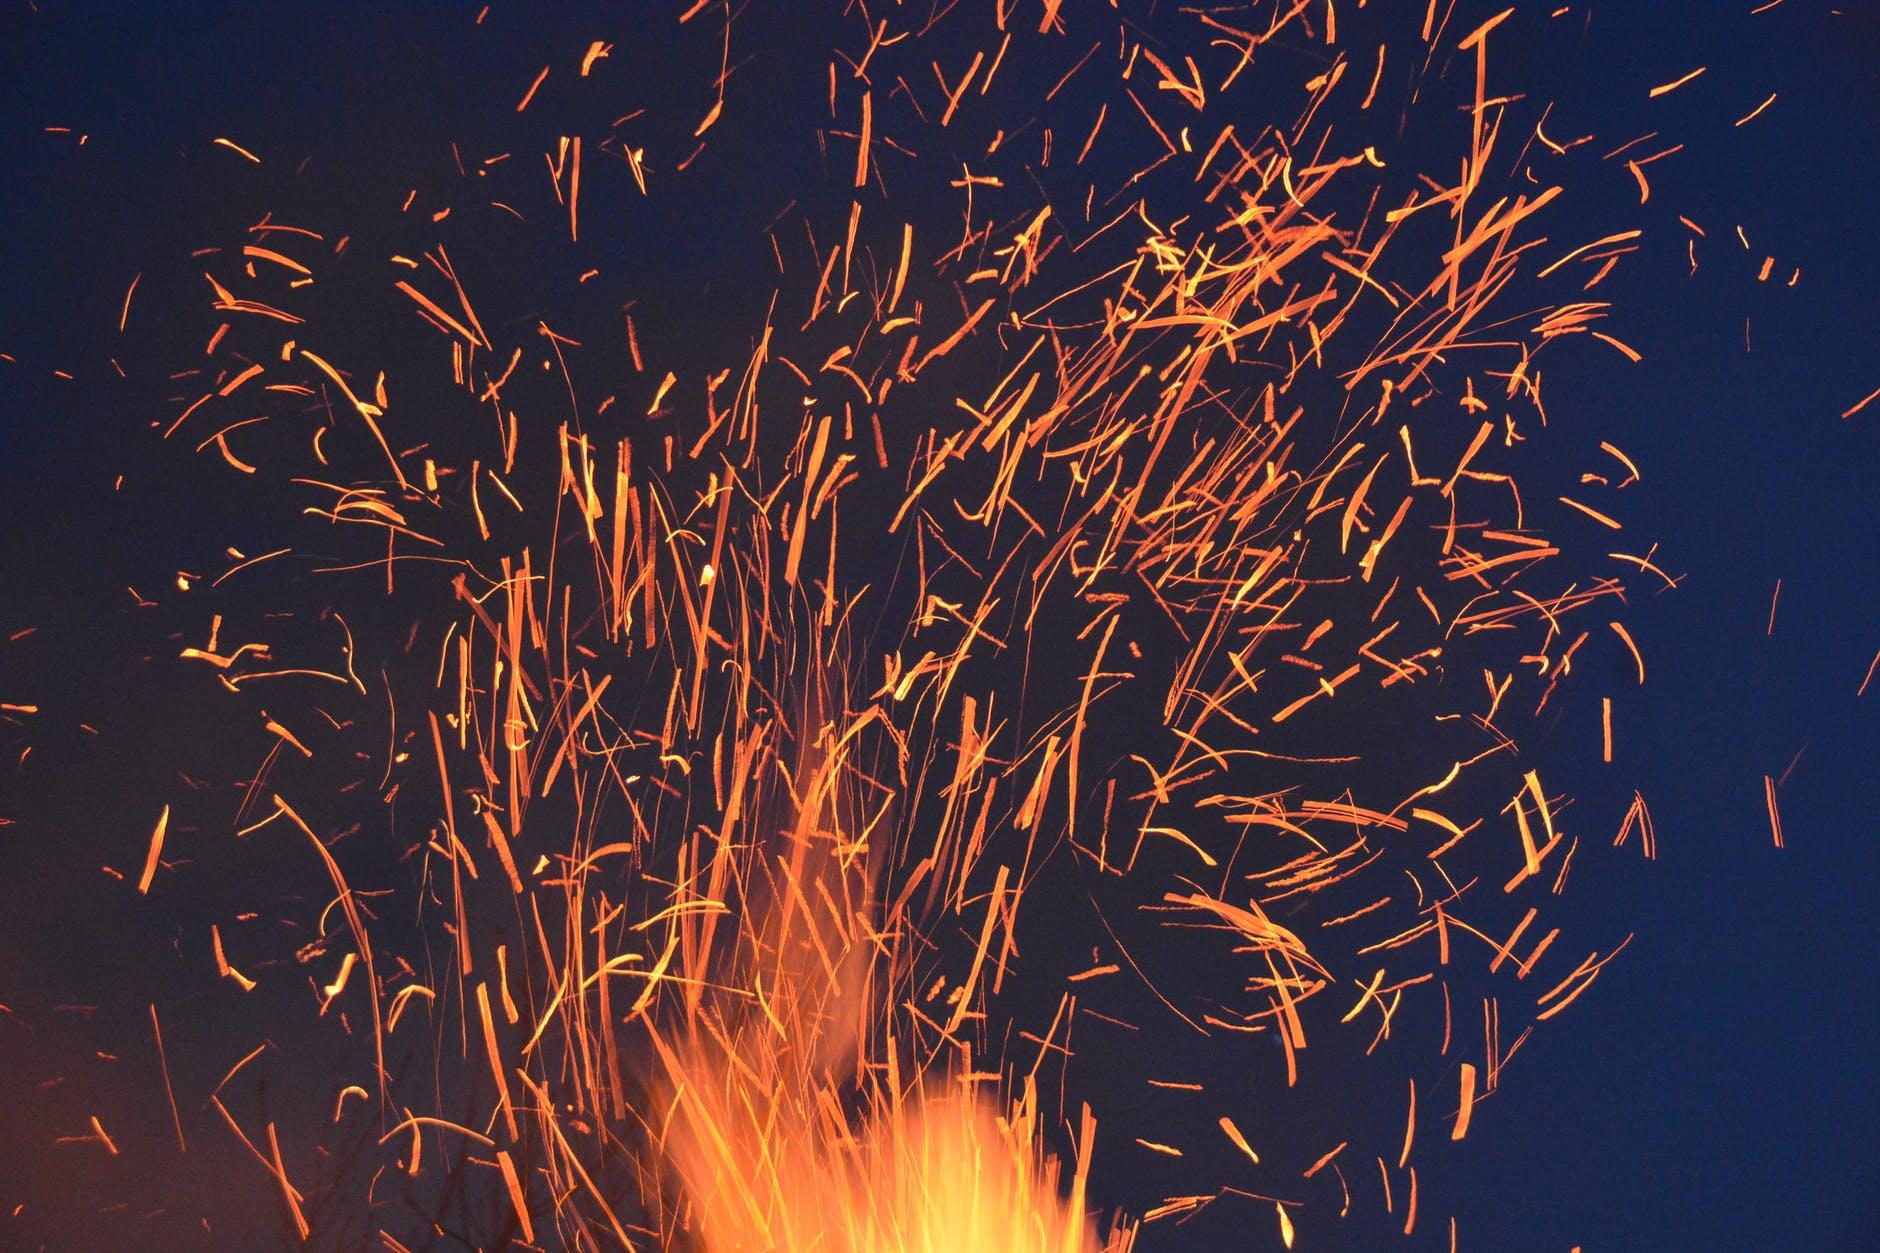 abstract art blaze bonfire